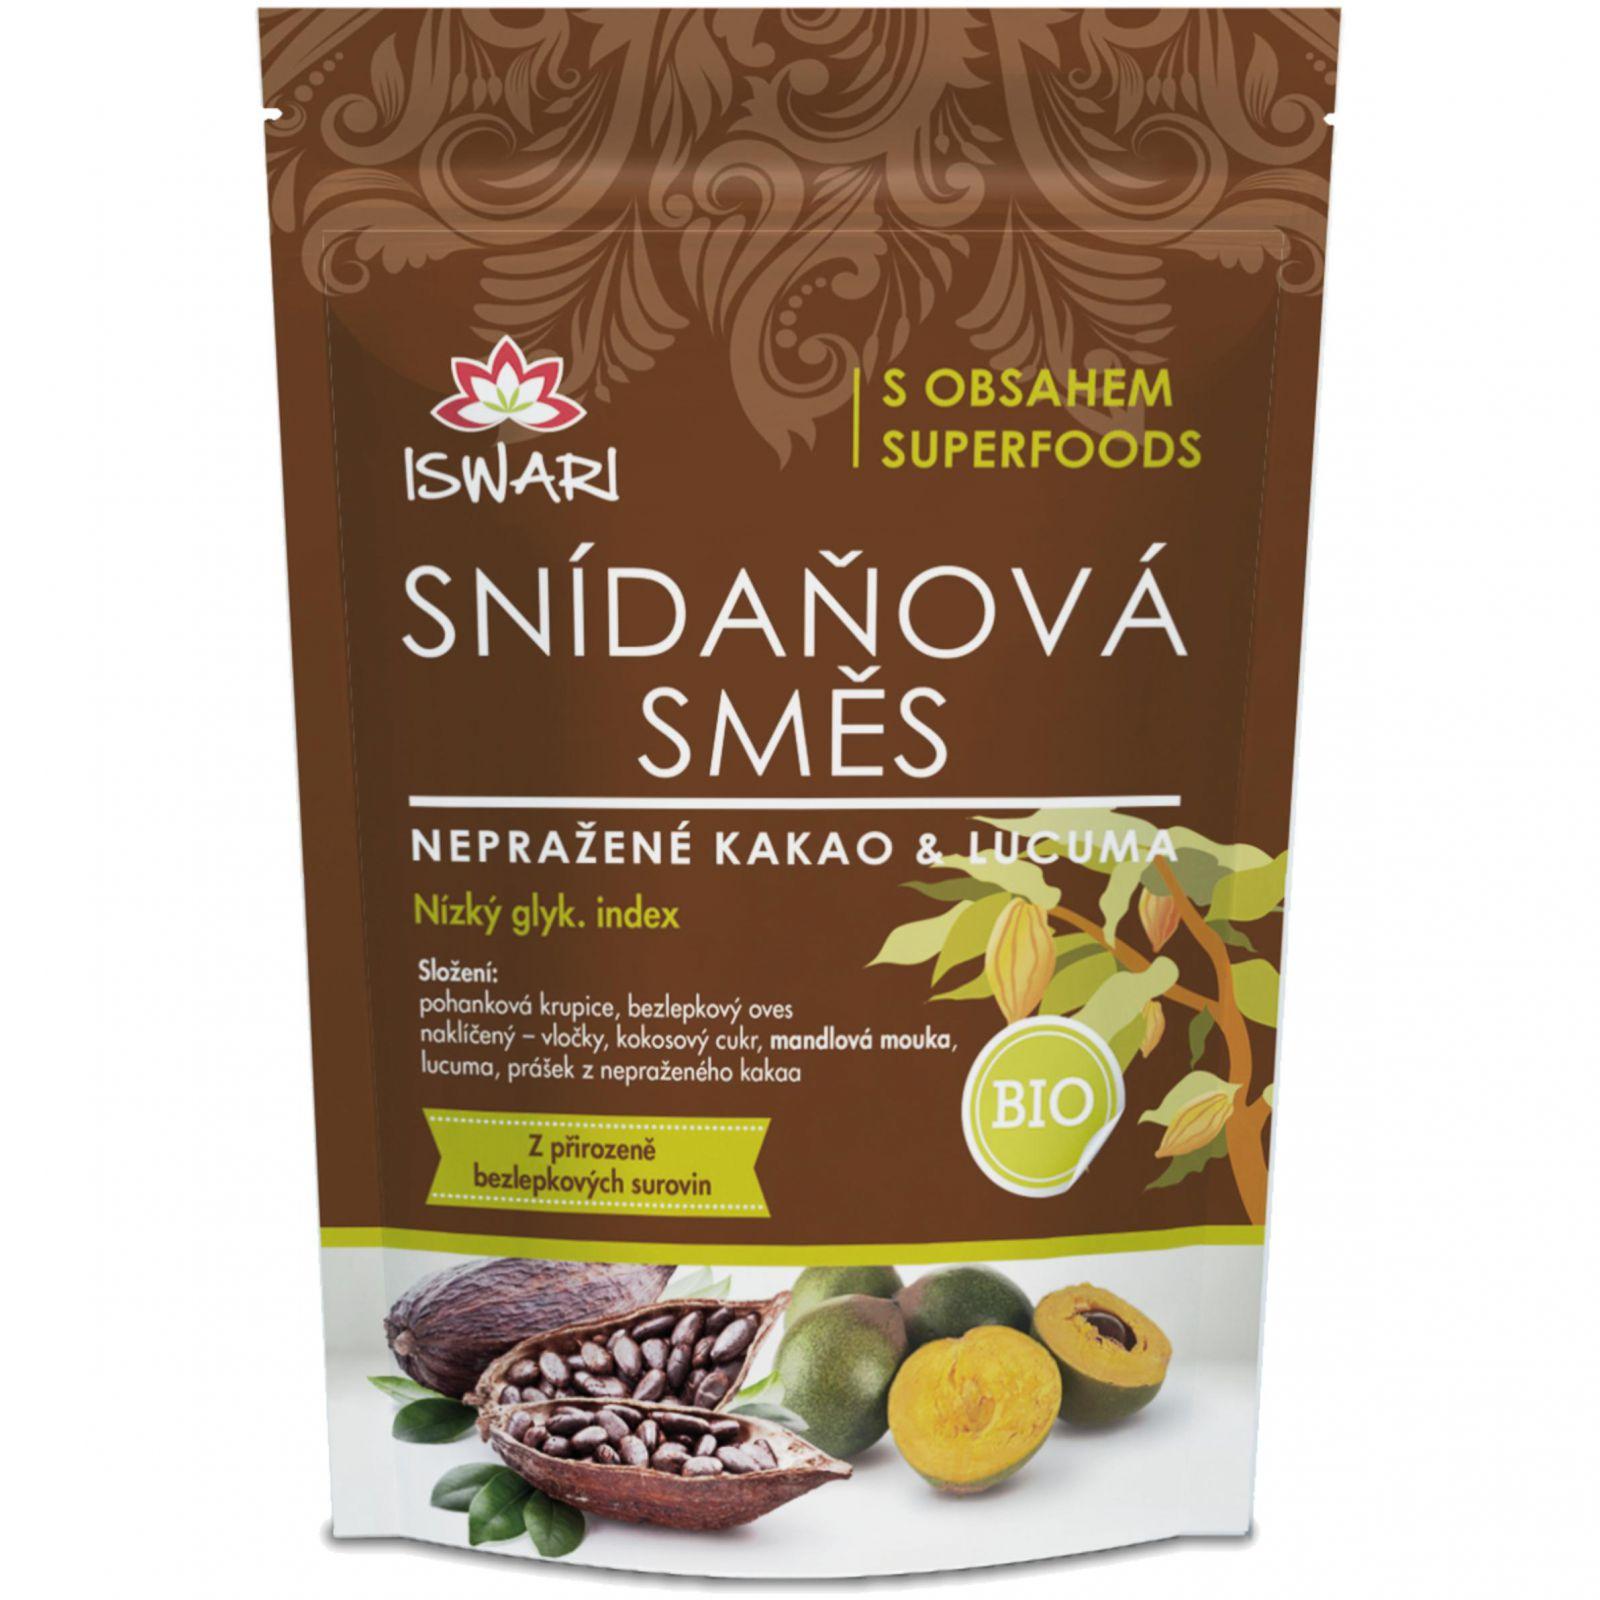 Iswari BIO Snídaňová směs 300 g - nepražené kakao & lucuma